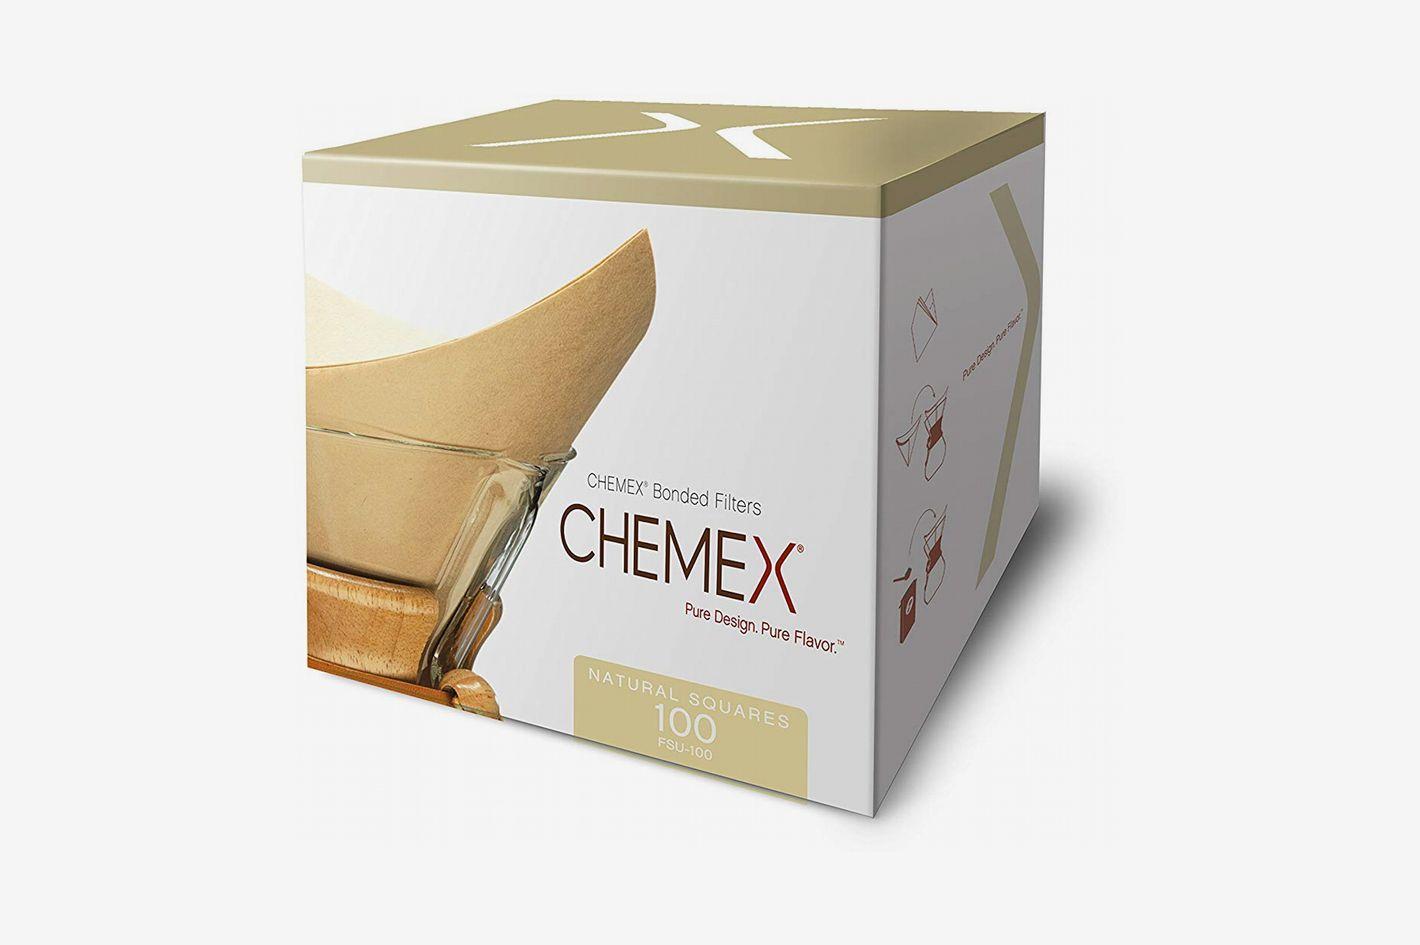 Chemex Unbleached Filters